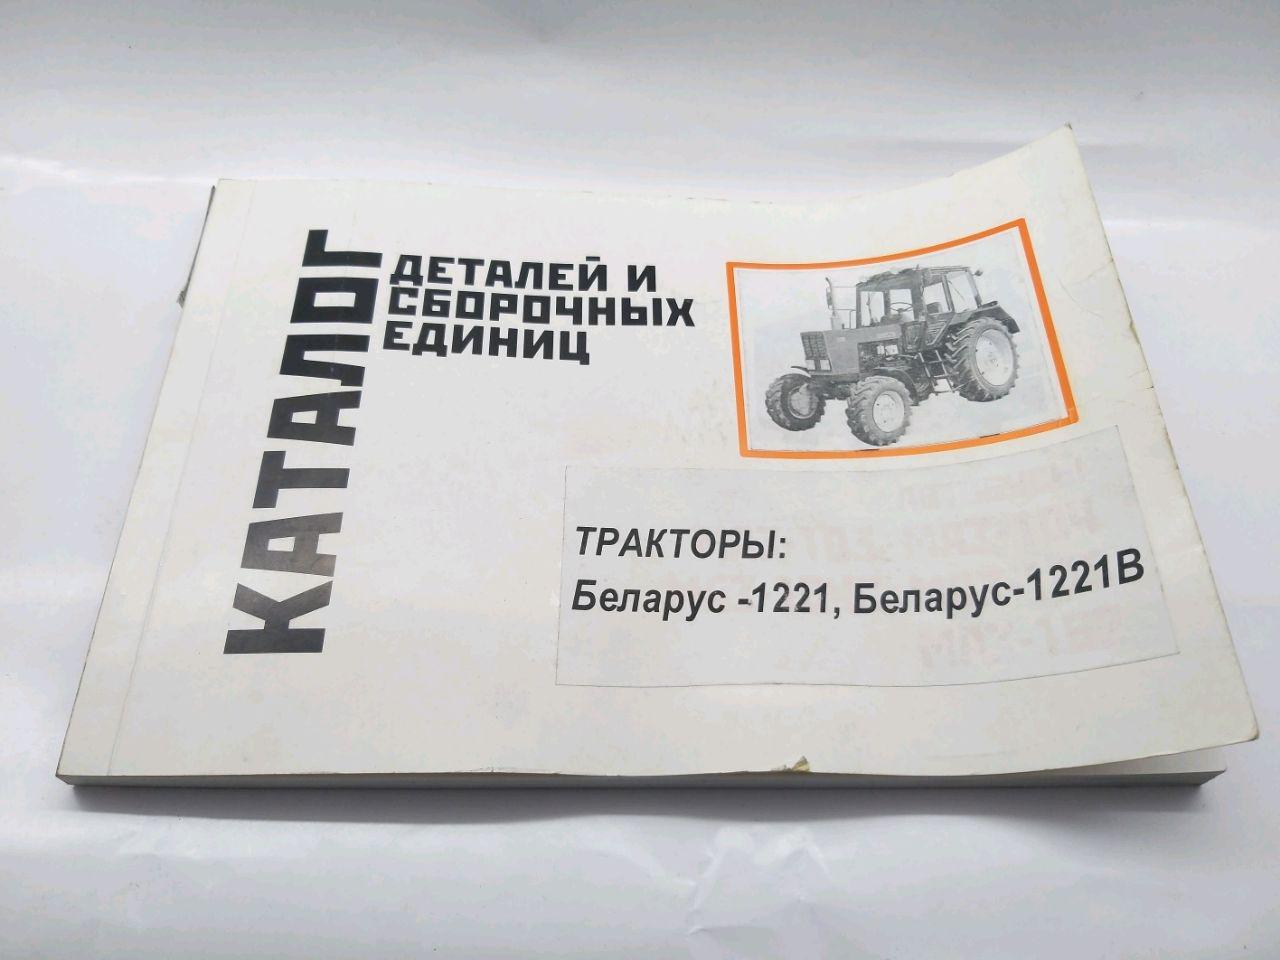 Catalog MTZ-1221